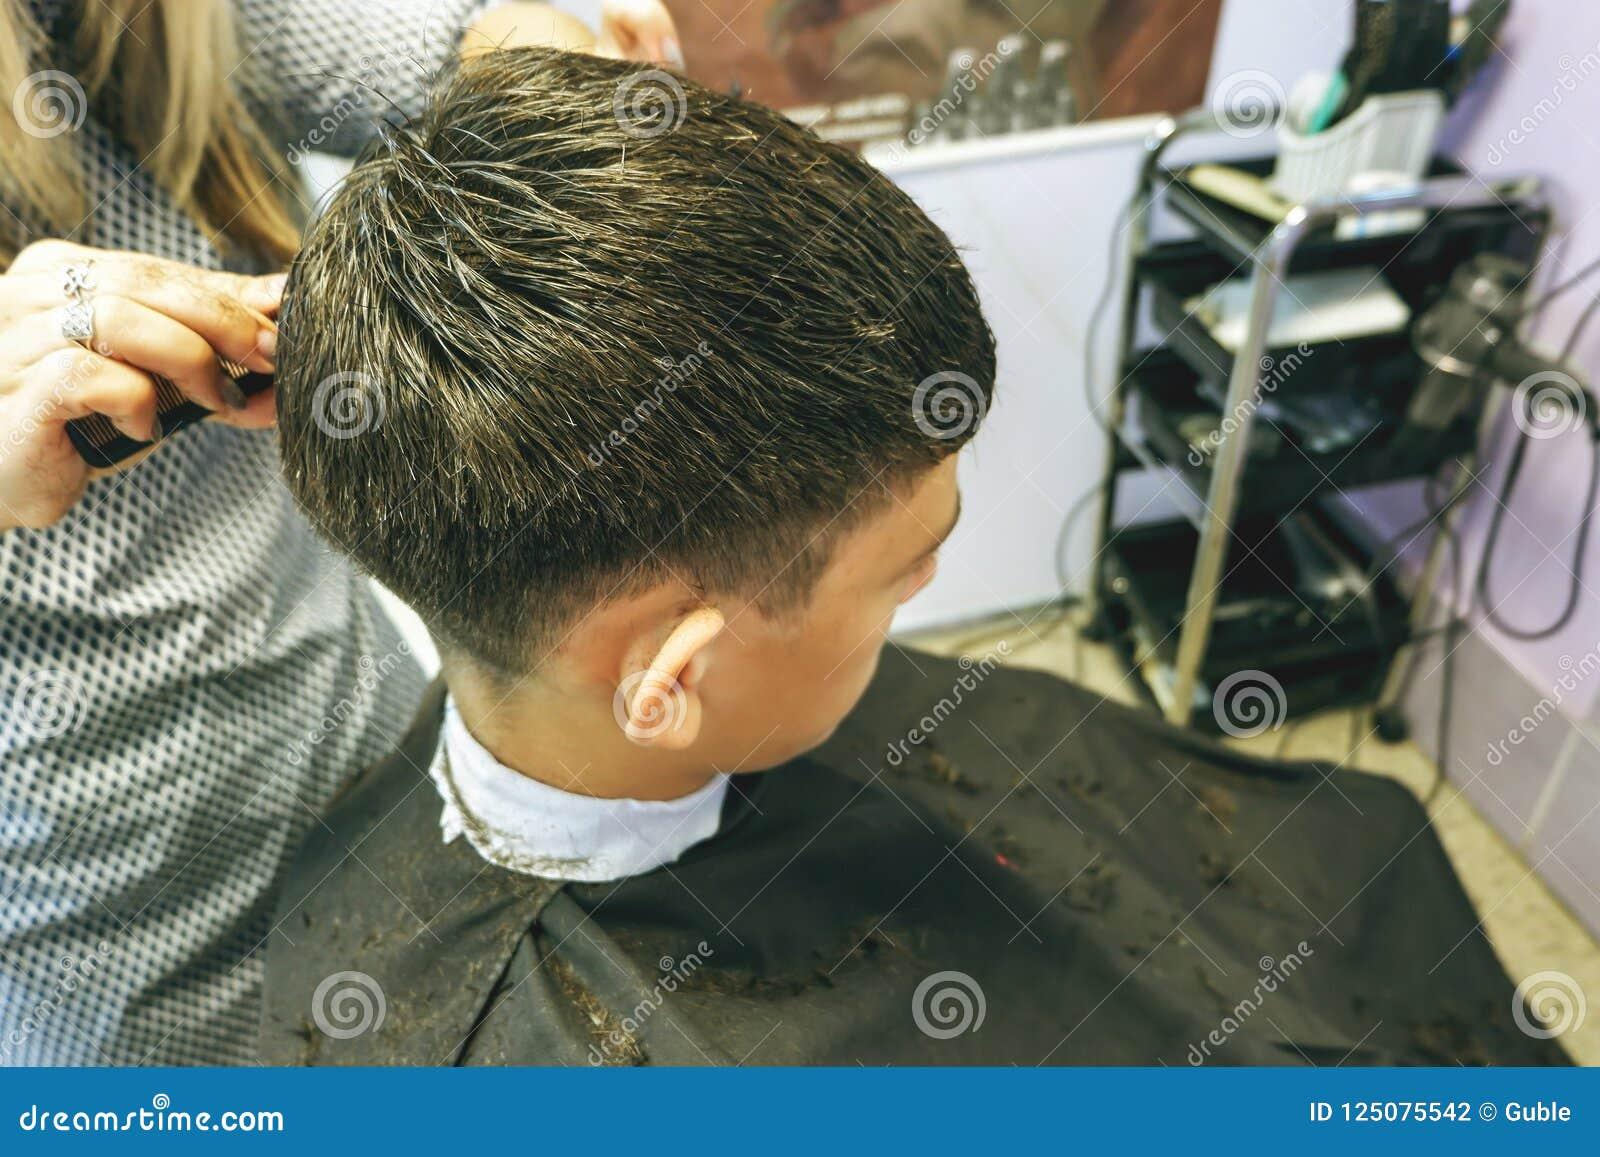 Barbershop Close Up Of Haircuts Teenager Master Does The Hair